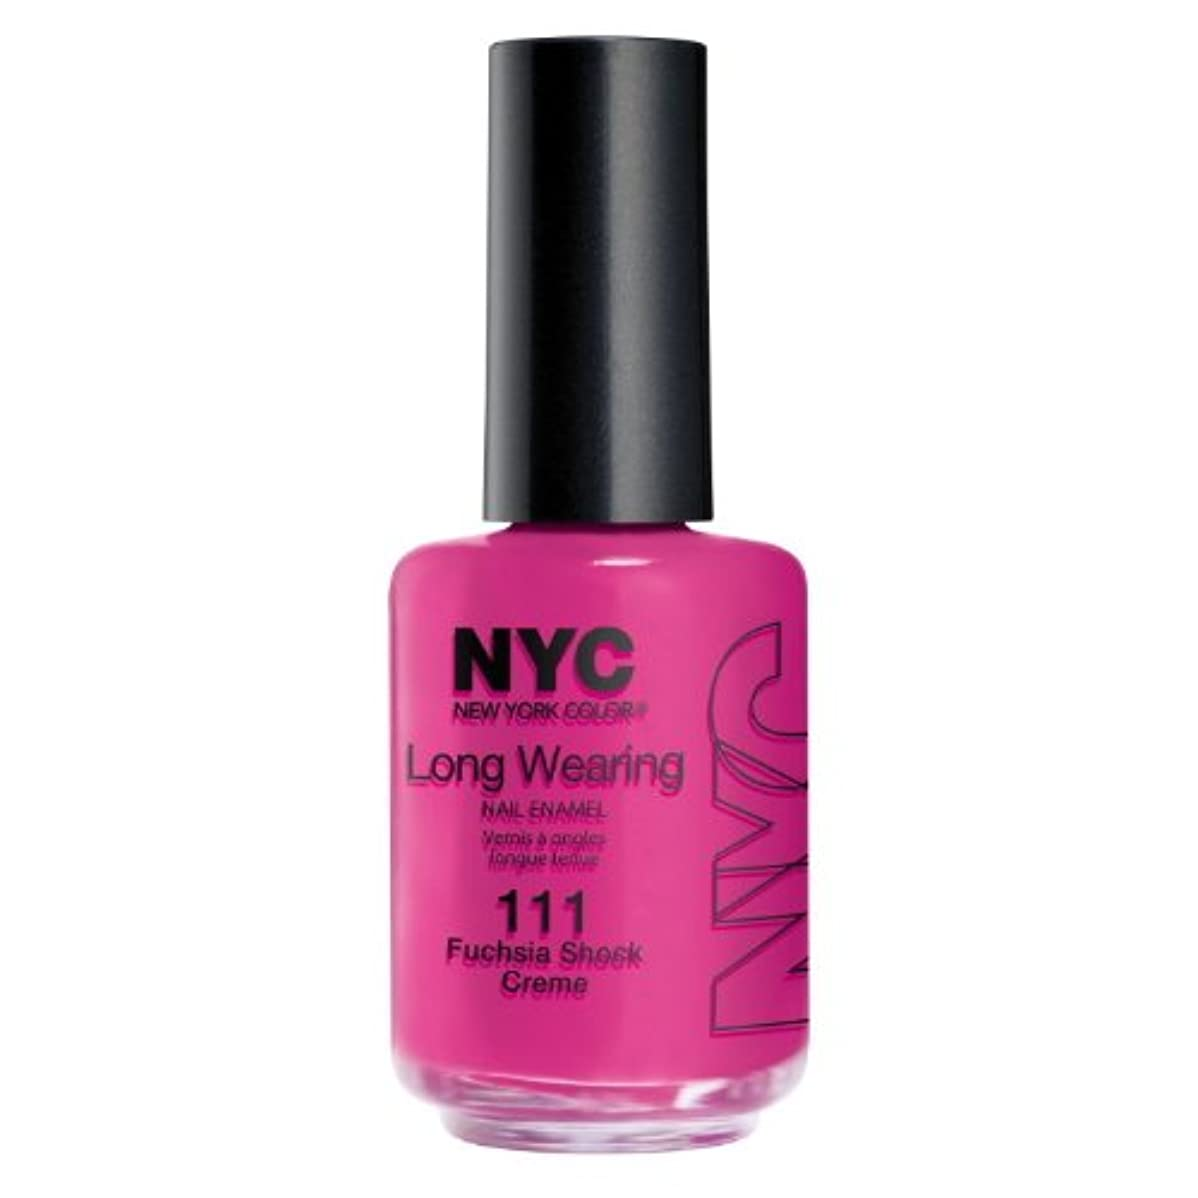 日曜日対人資本(3 Pack) NYC Long Wearing Nail Enamel - Fuchisia Shock Creme (並行輸入品)